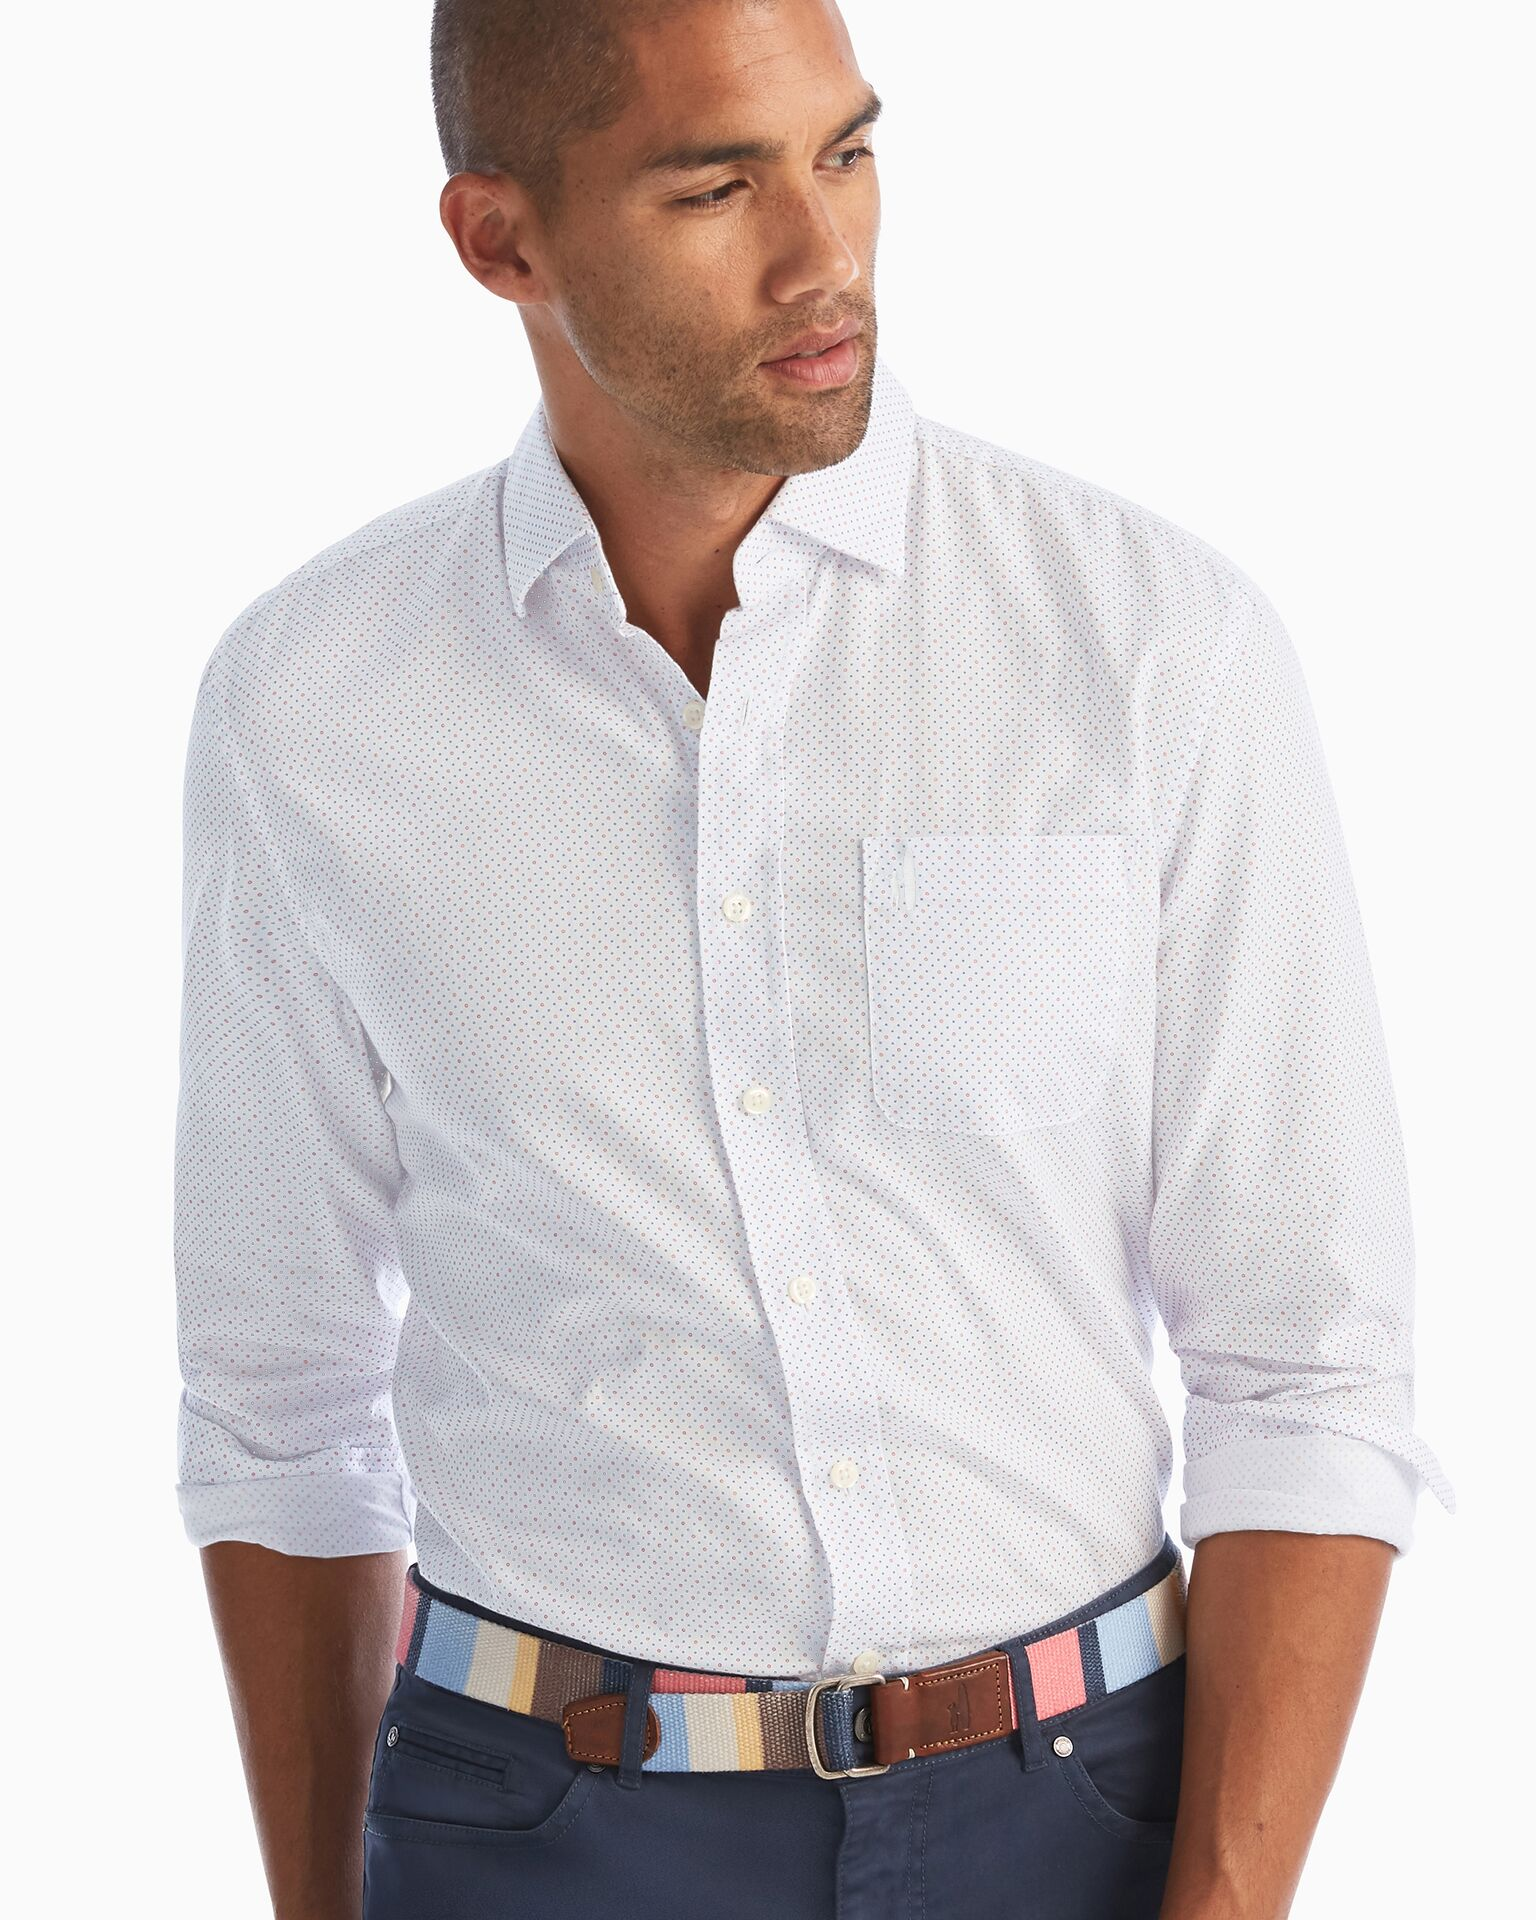 Schubert Printed Hangin' Out Button Down Shirt (White)